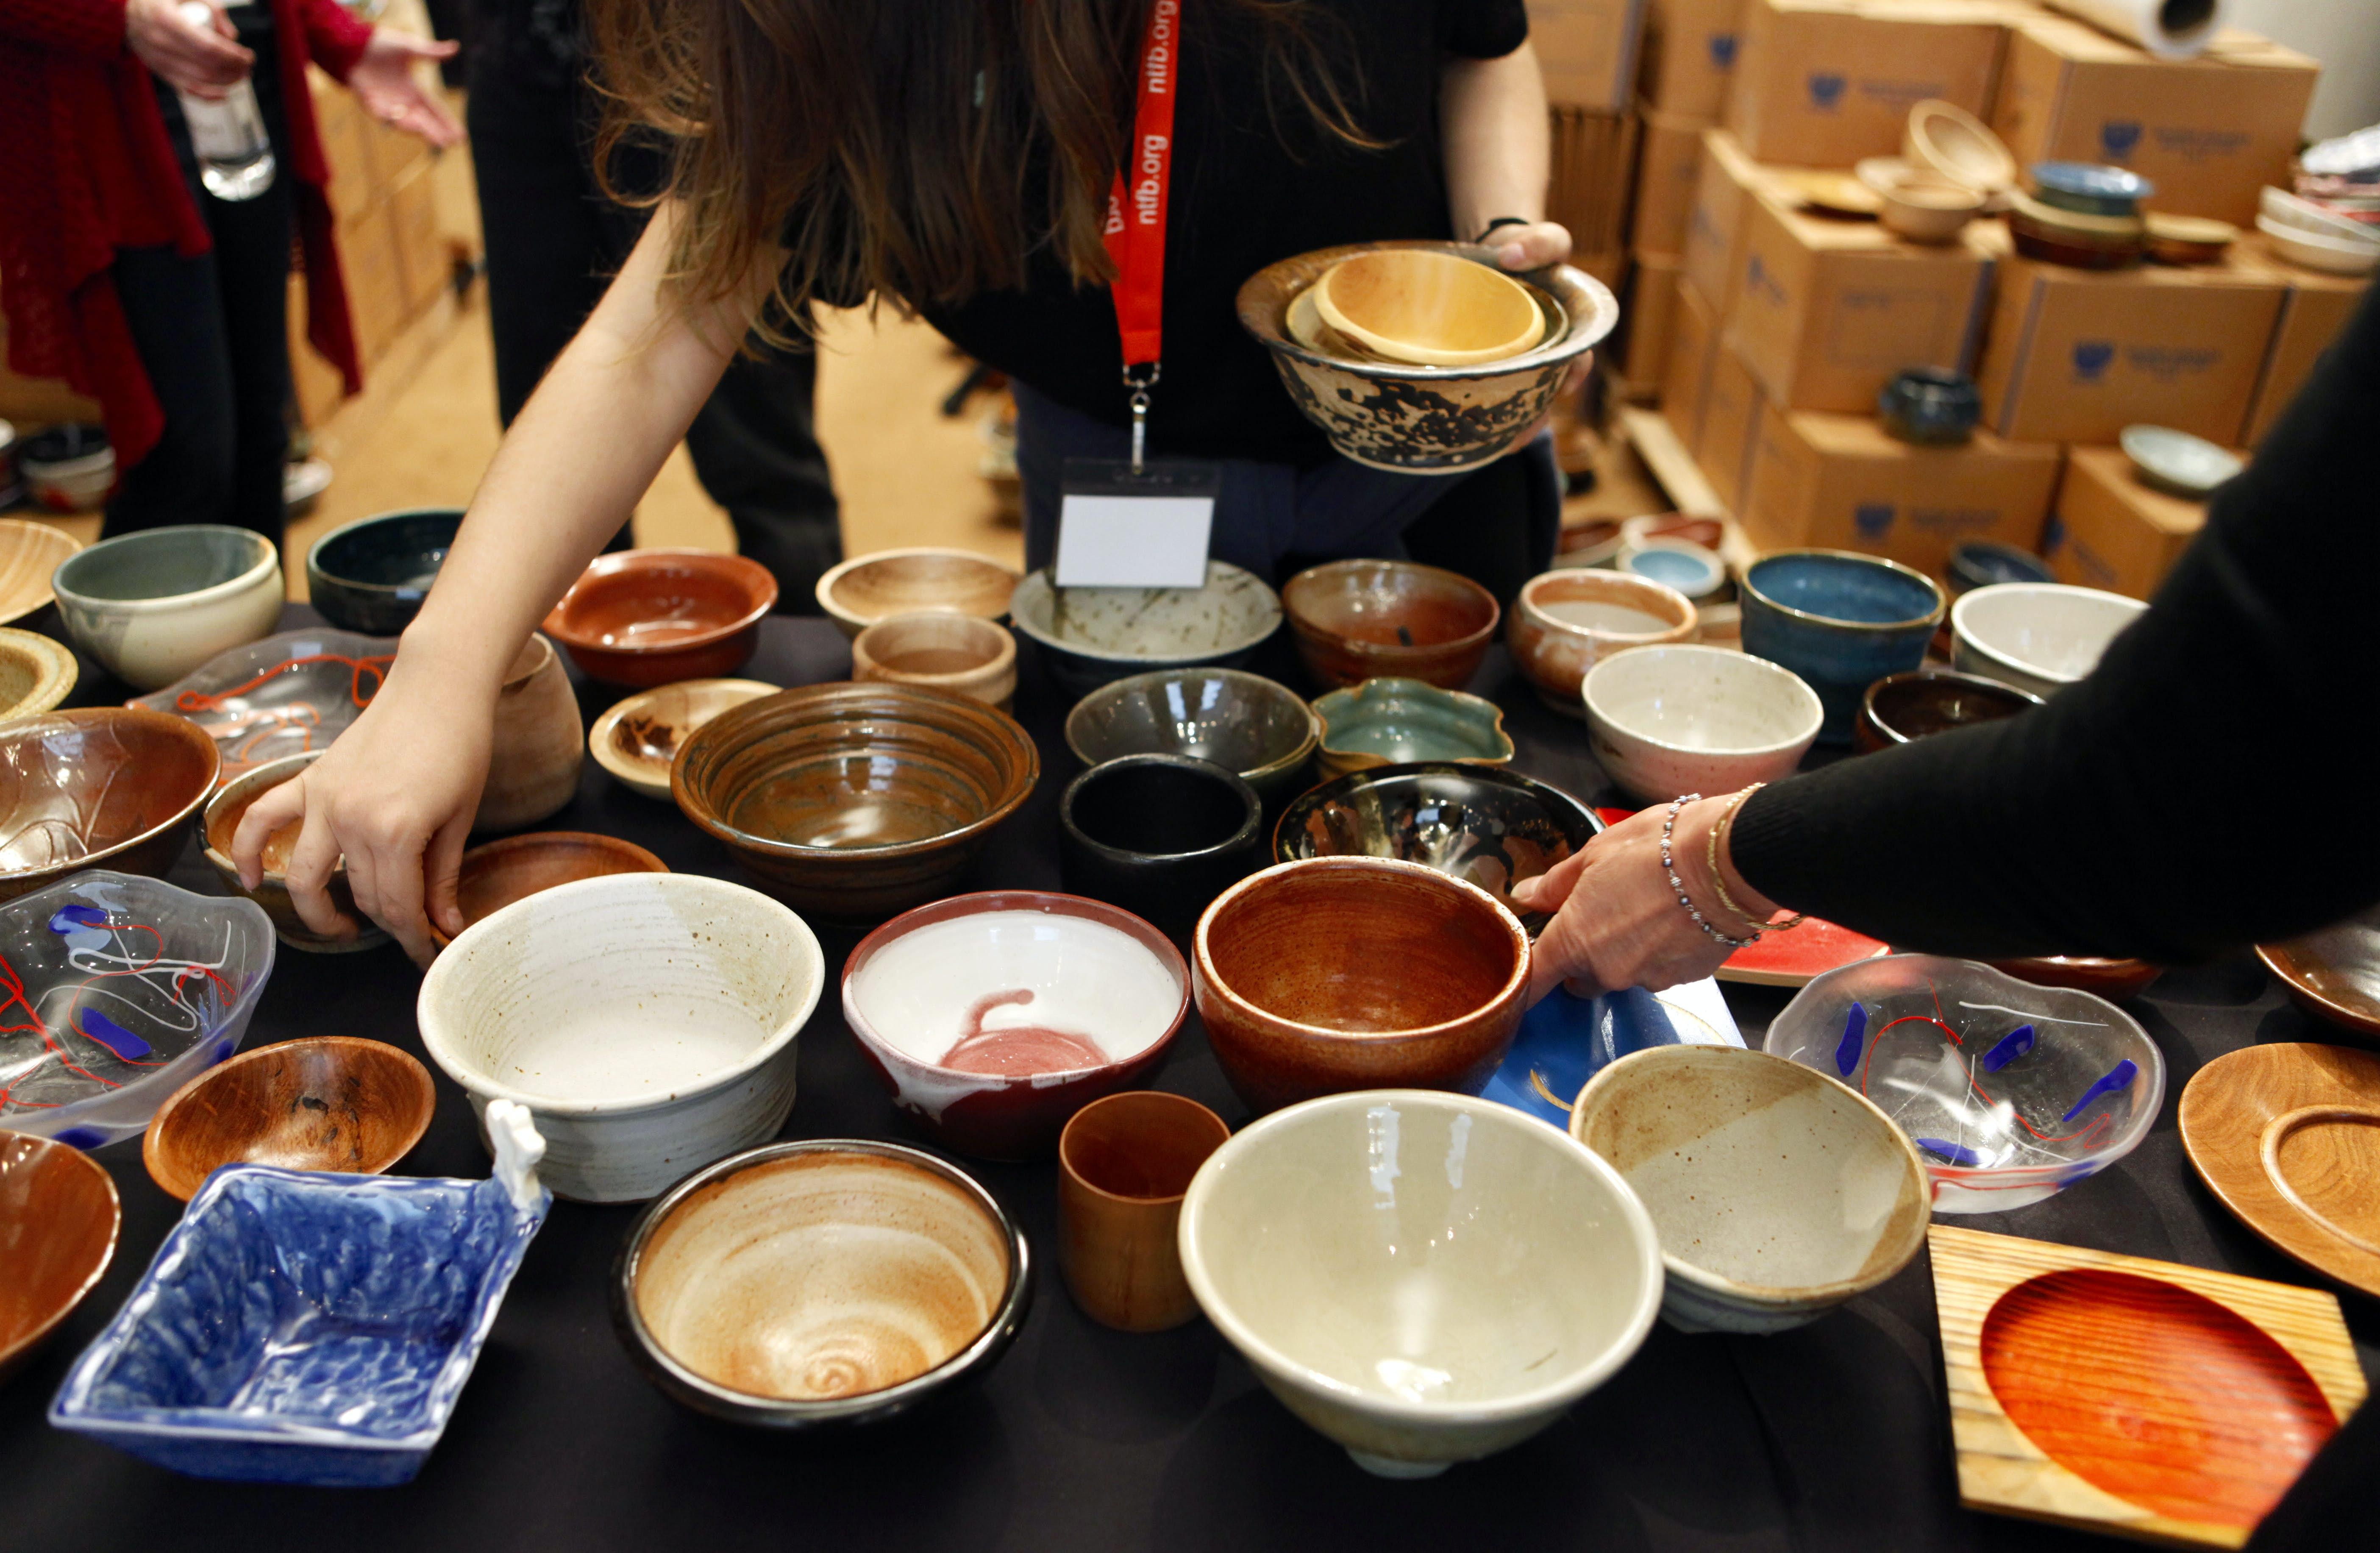 South Texas Food Bank Empty Bowls